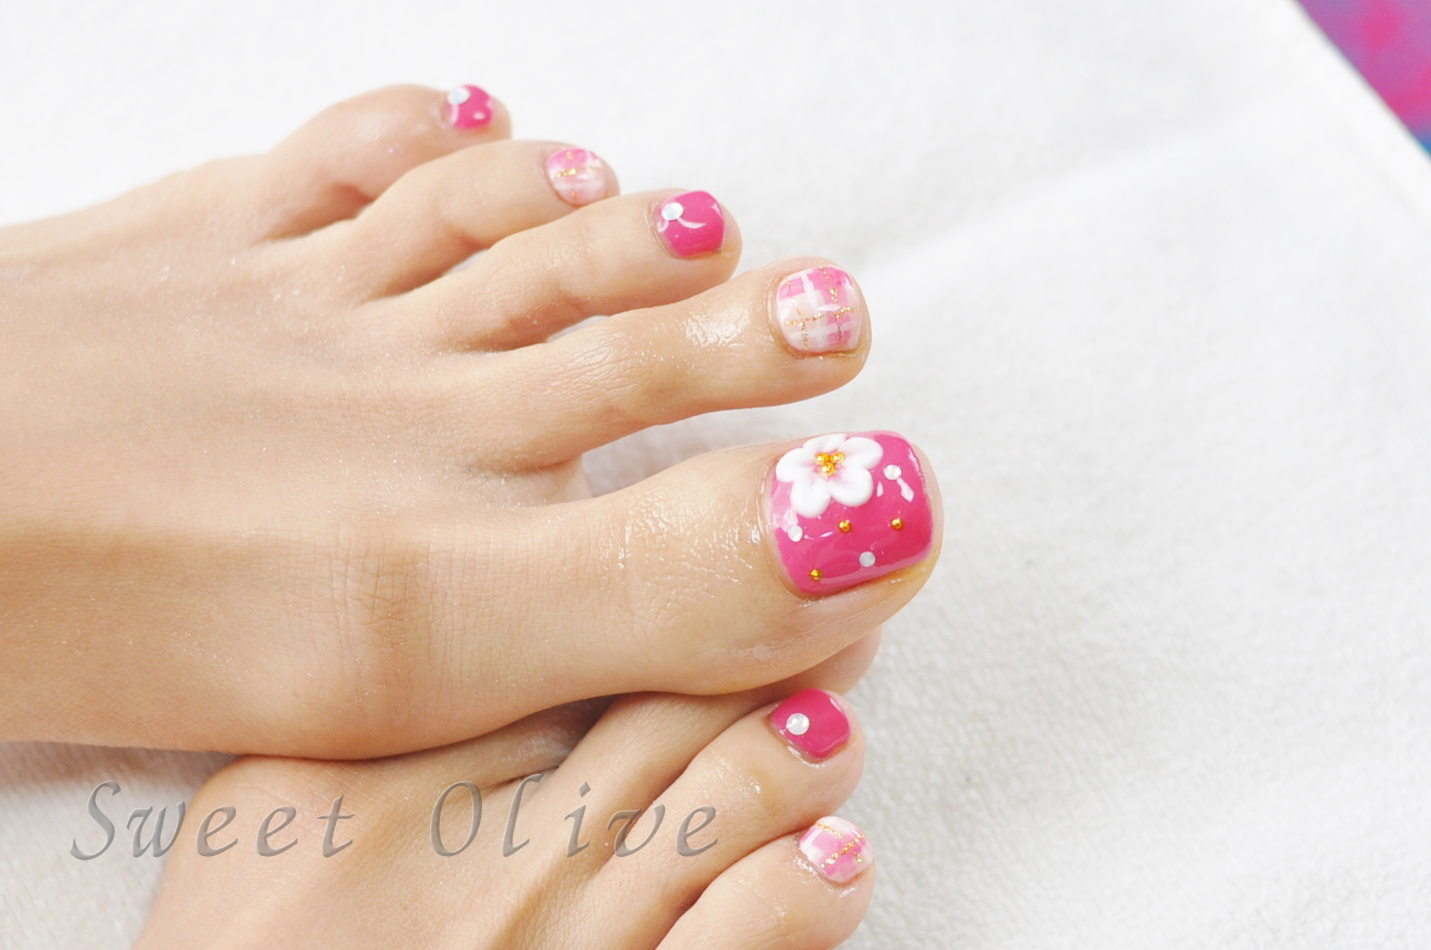 3Dフラワー,ピンク,花柄,チェック柄,可愛い,フットジェルネイル